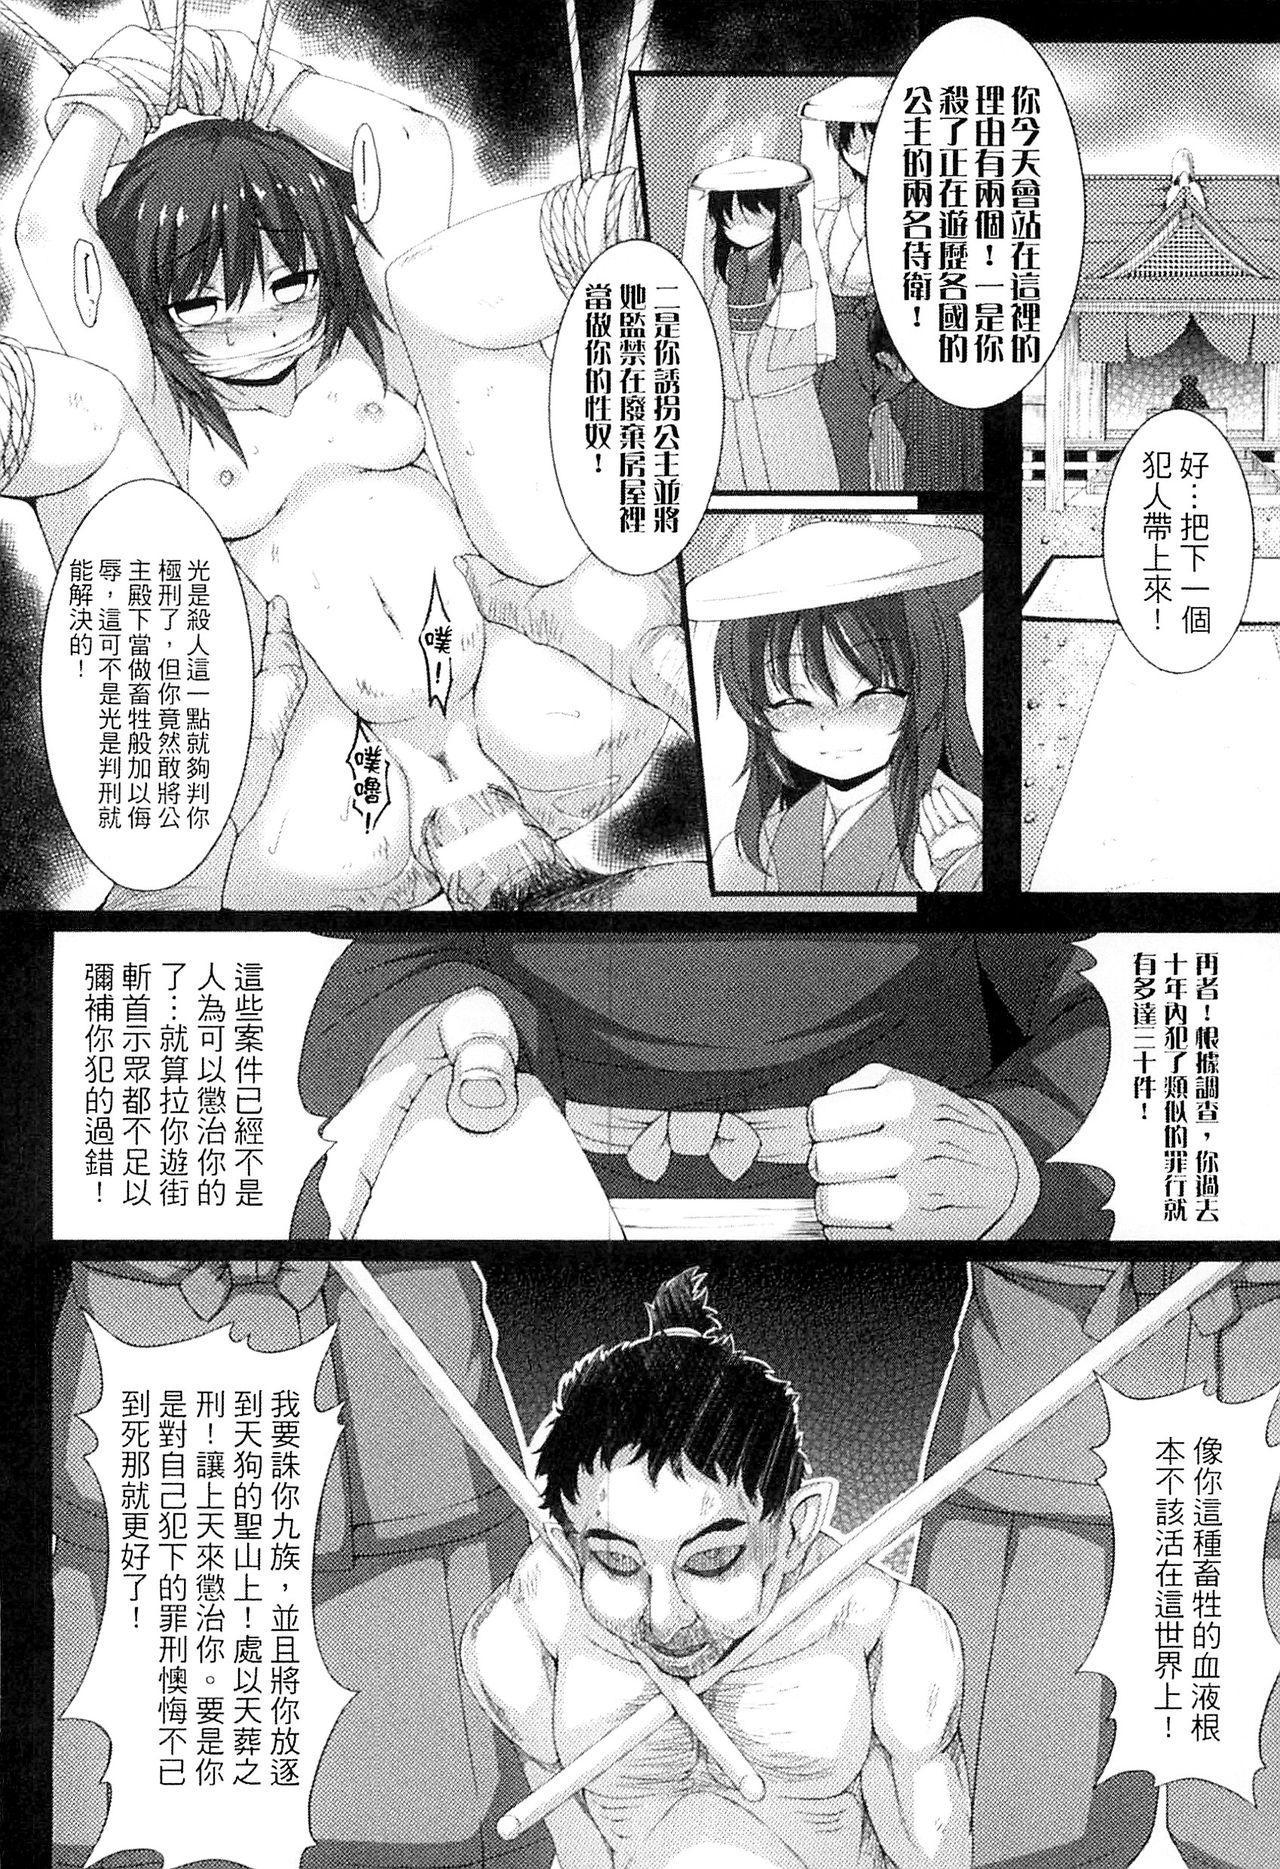 [Takayuki Hiyori] Aiyoku Gensou no Kai ~Cthulhu Pregnant~   愛欲幻想之怪 -克蘇魯- [Chinese] 146